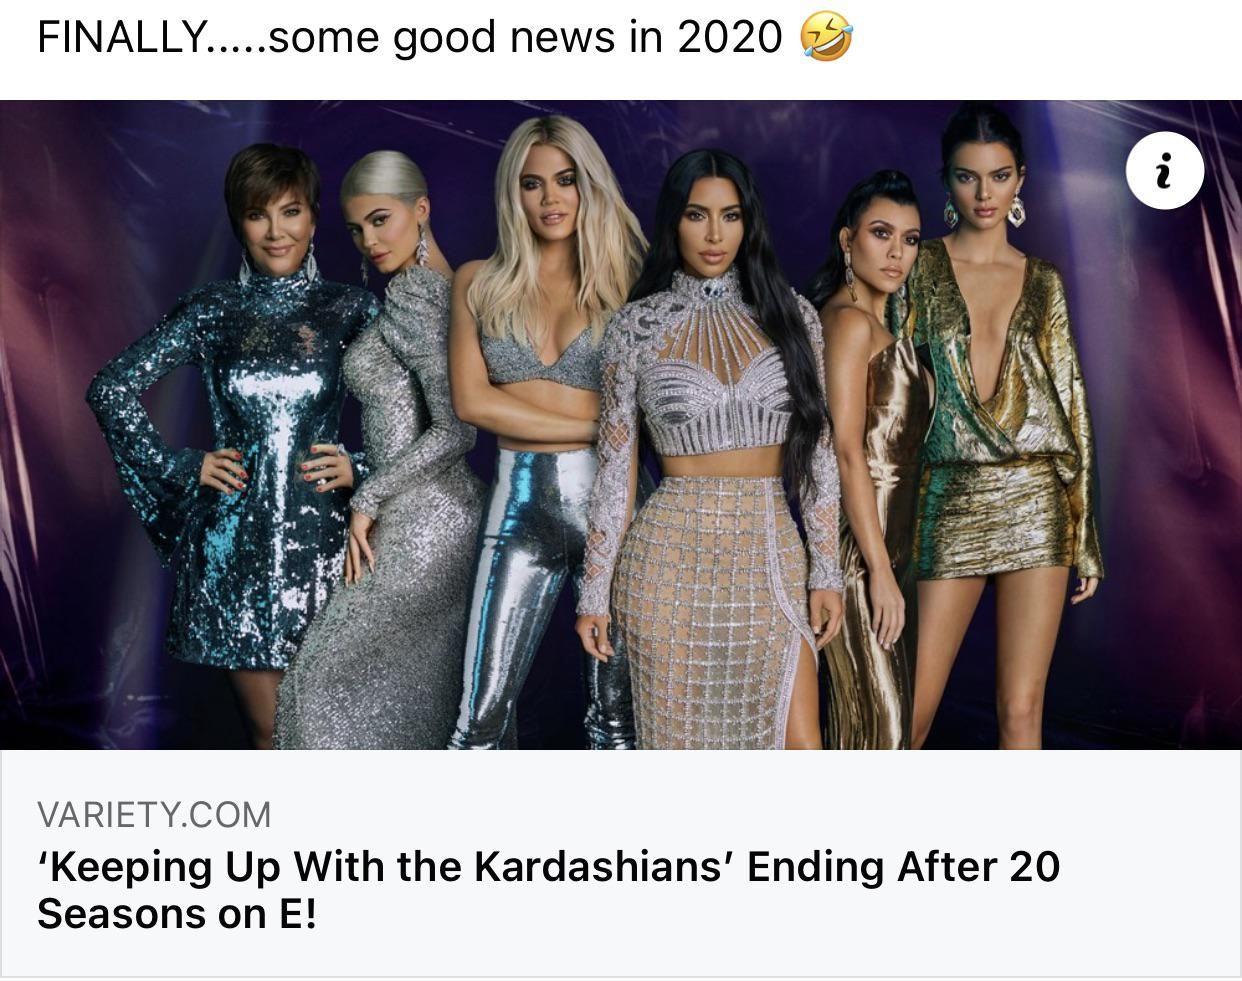 Finally! Good news in 2020